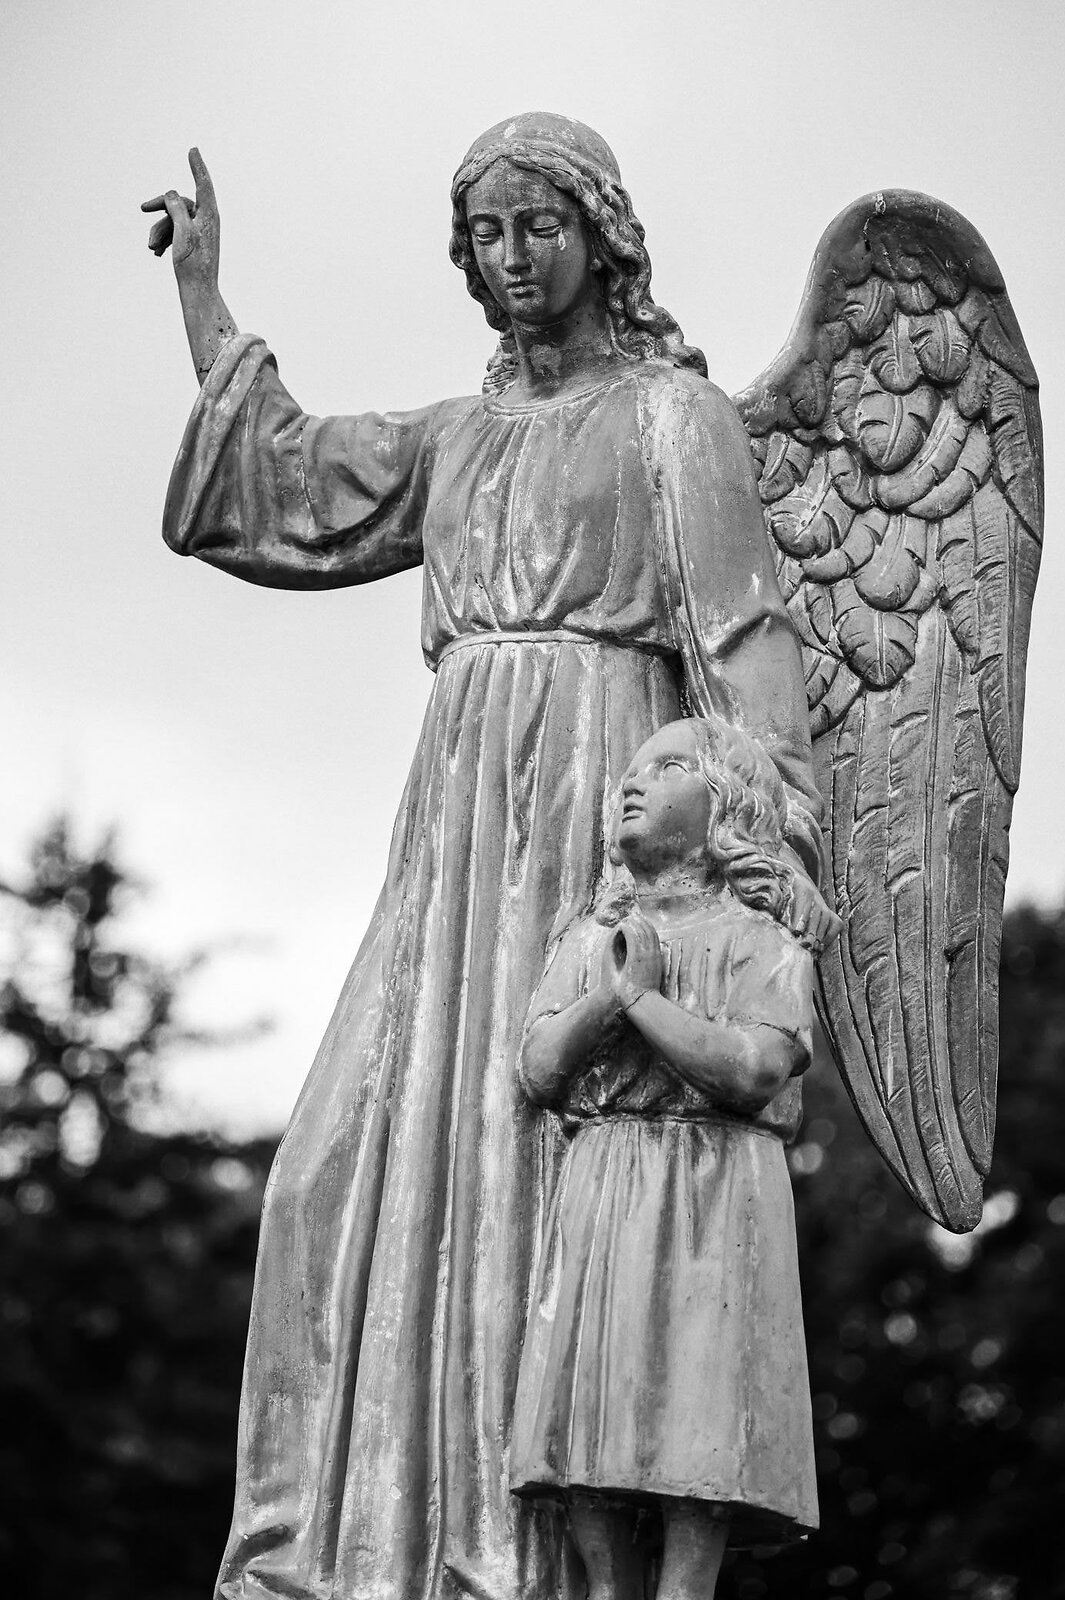 08-02-2020_cemetery_NZ6_6598_tmax400.jpg